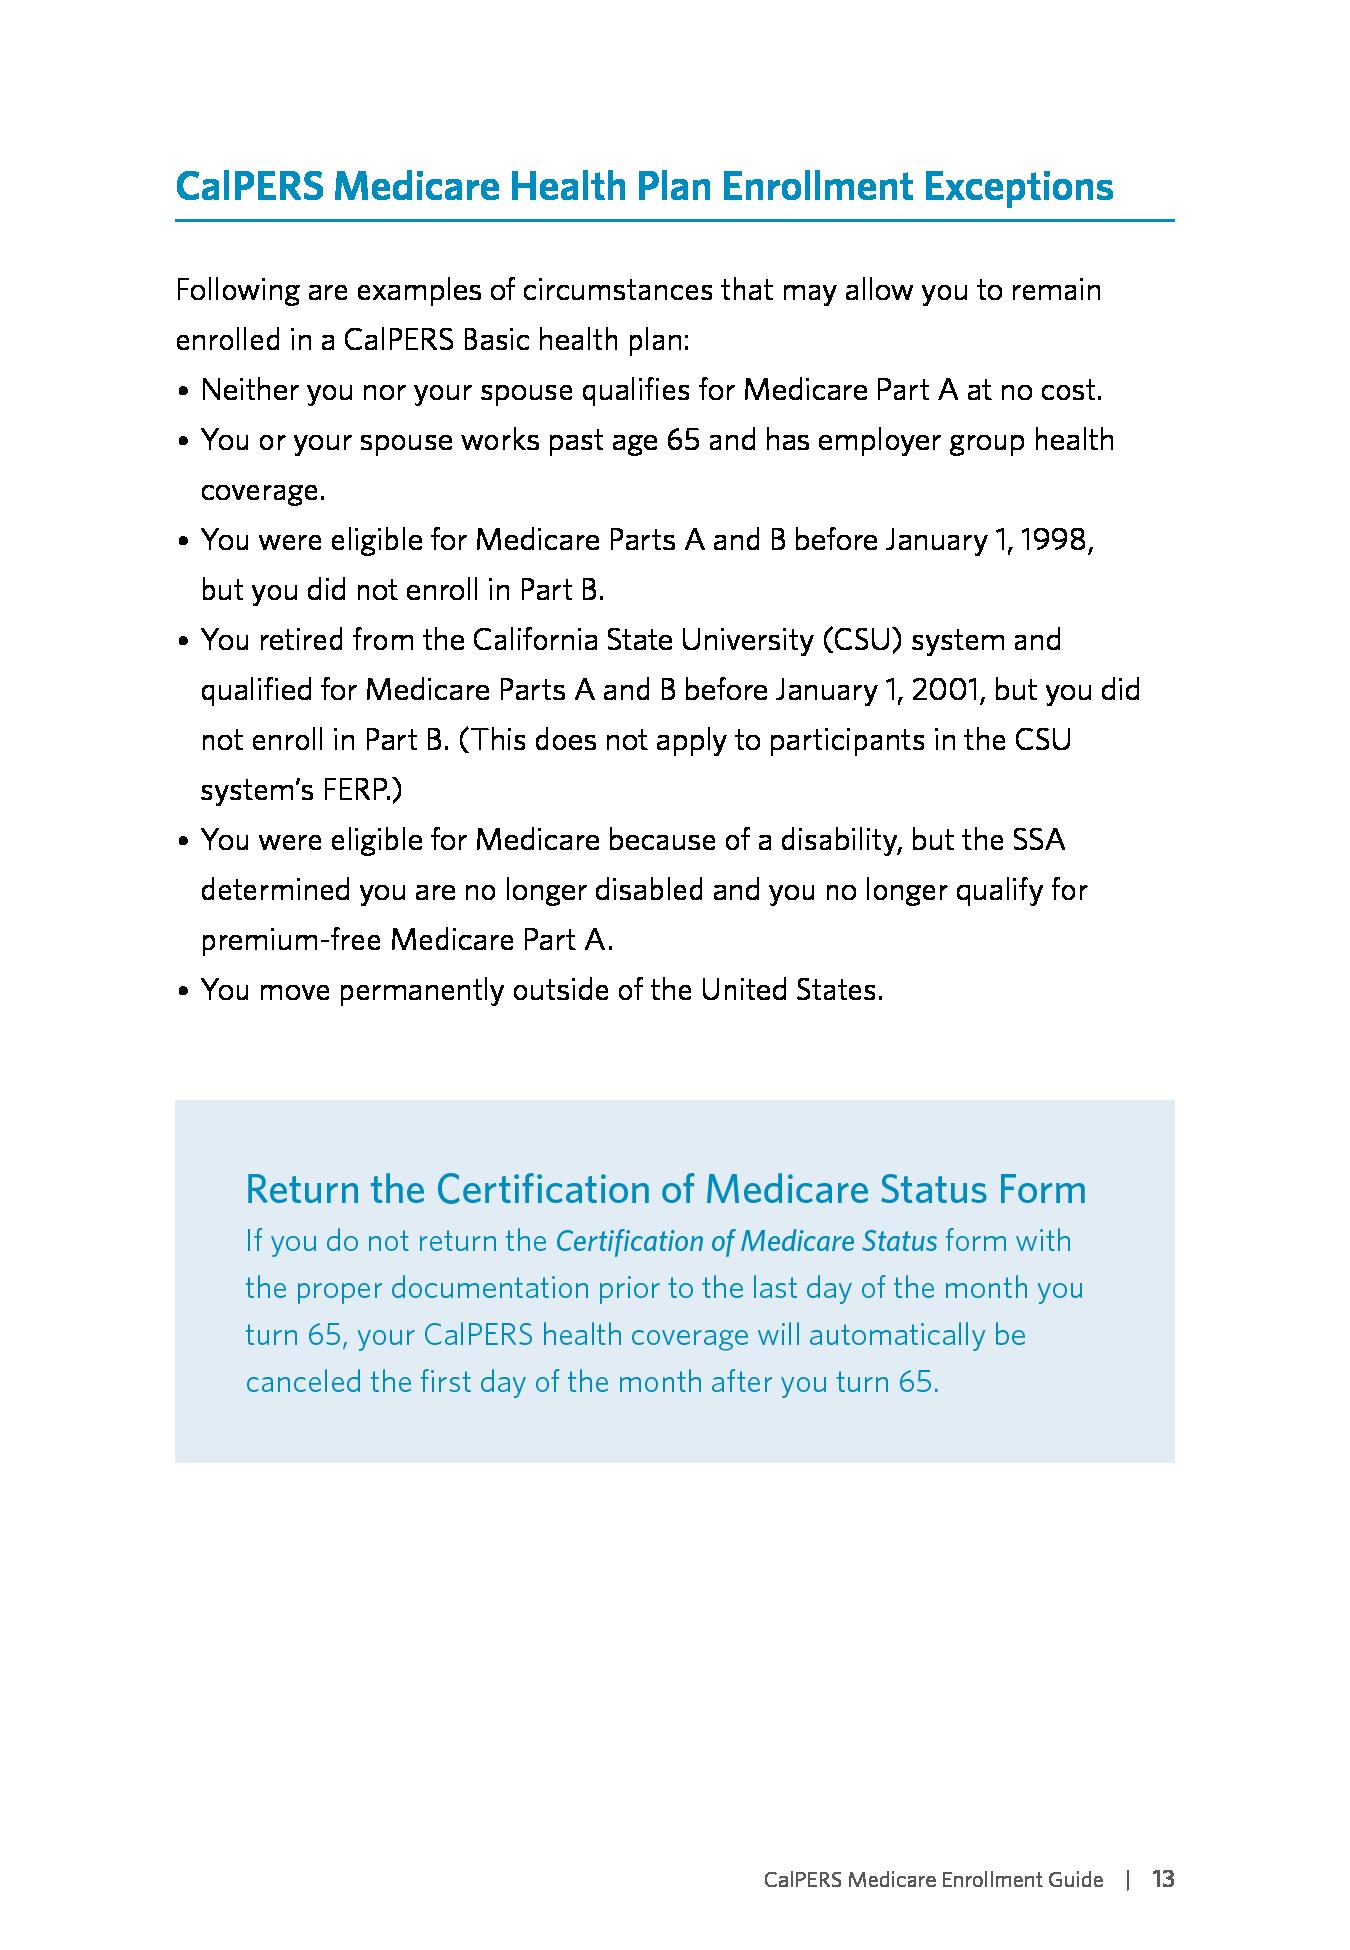 Advisorselect - The CalPERS Medicare Enrollment Guide